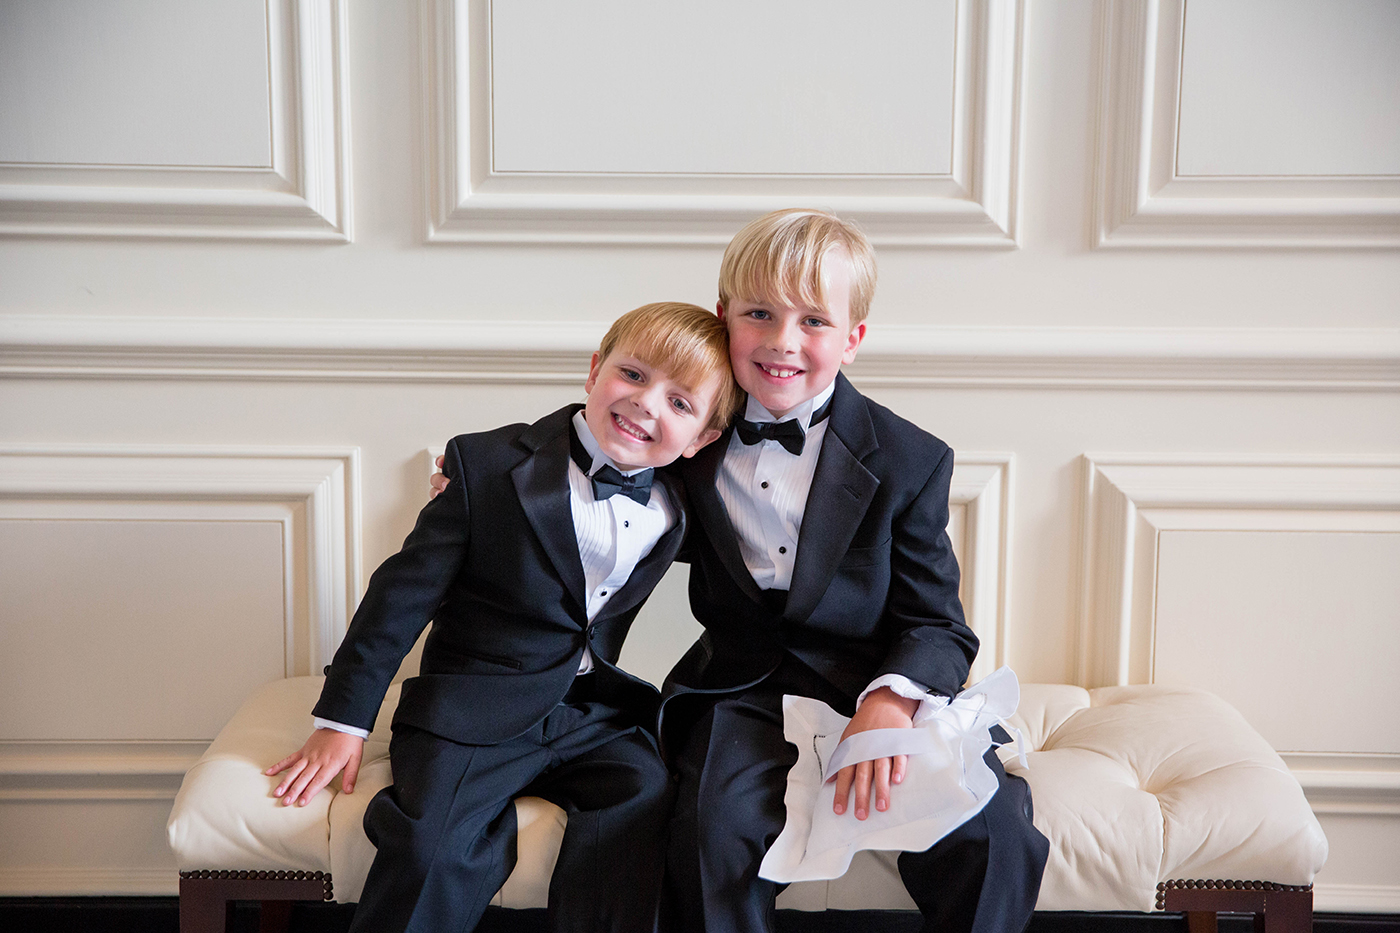 Dallas TX Wedding Planner - Allday Events - Hall on Dragon Wedding - 00031.jpg